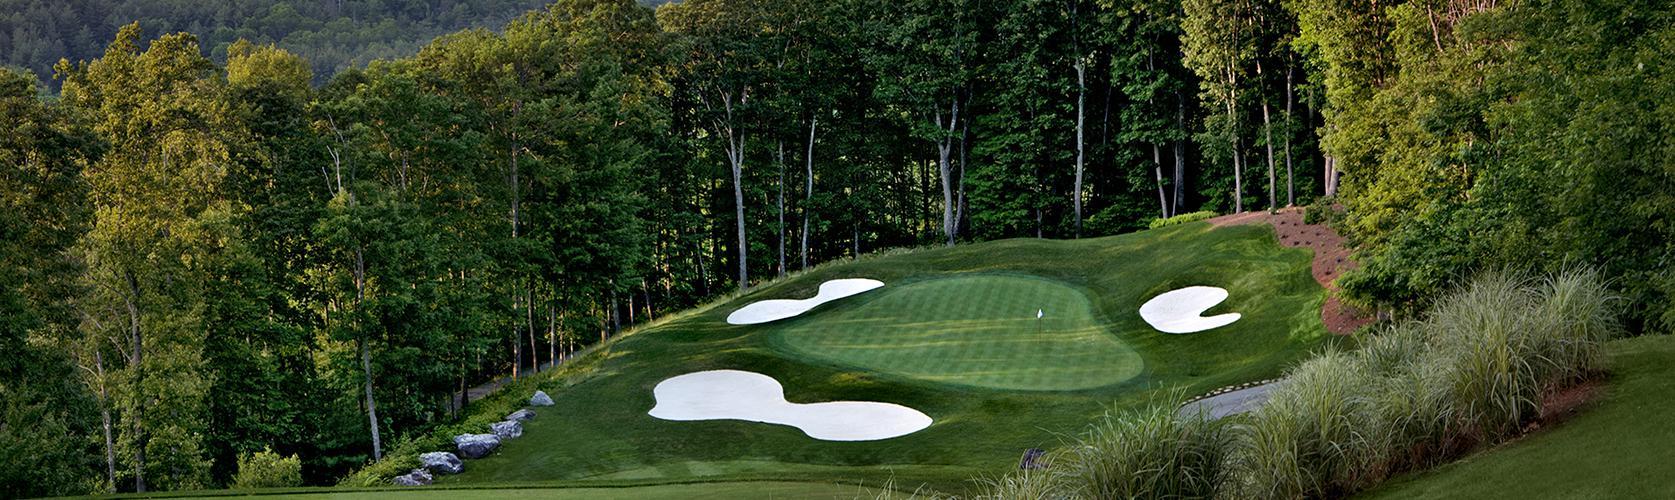 old-edwards-inn-club-golf-highlands-nc.jpg